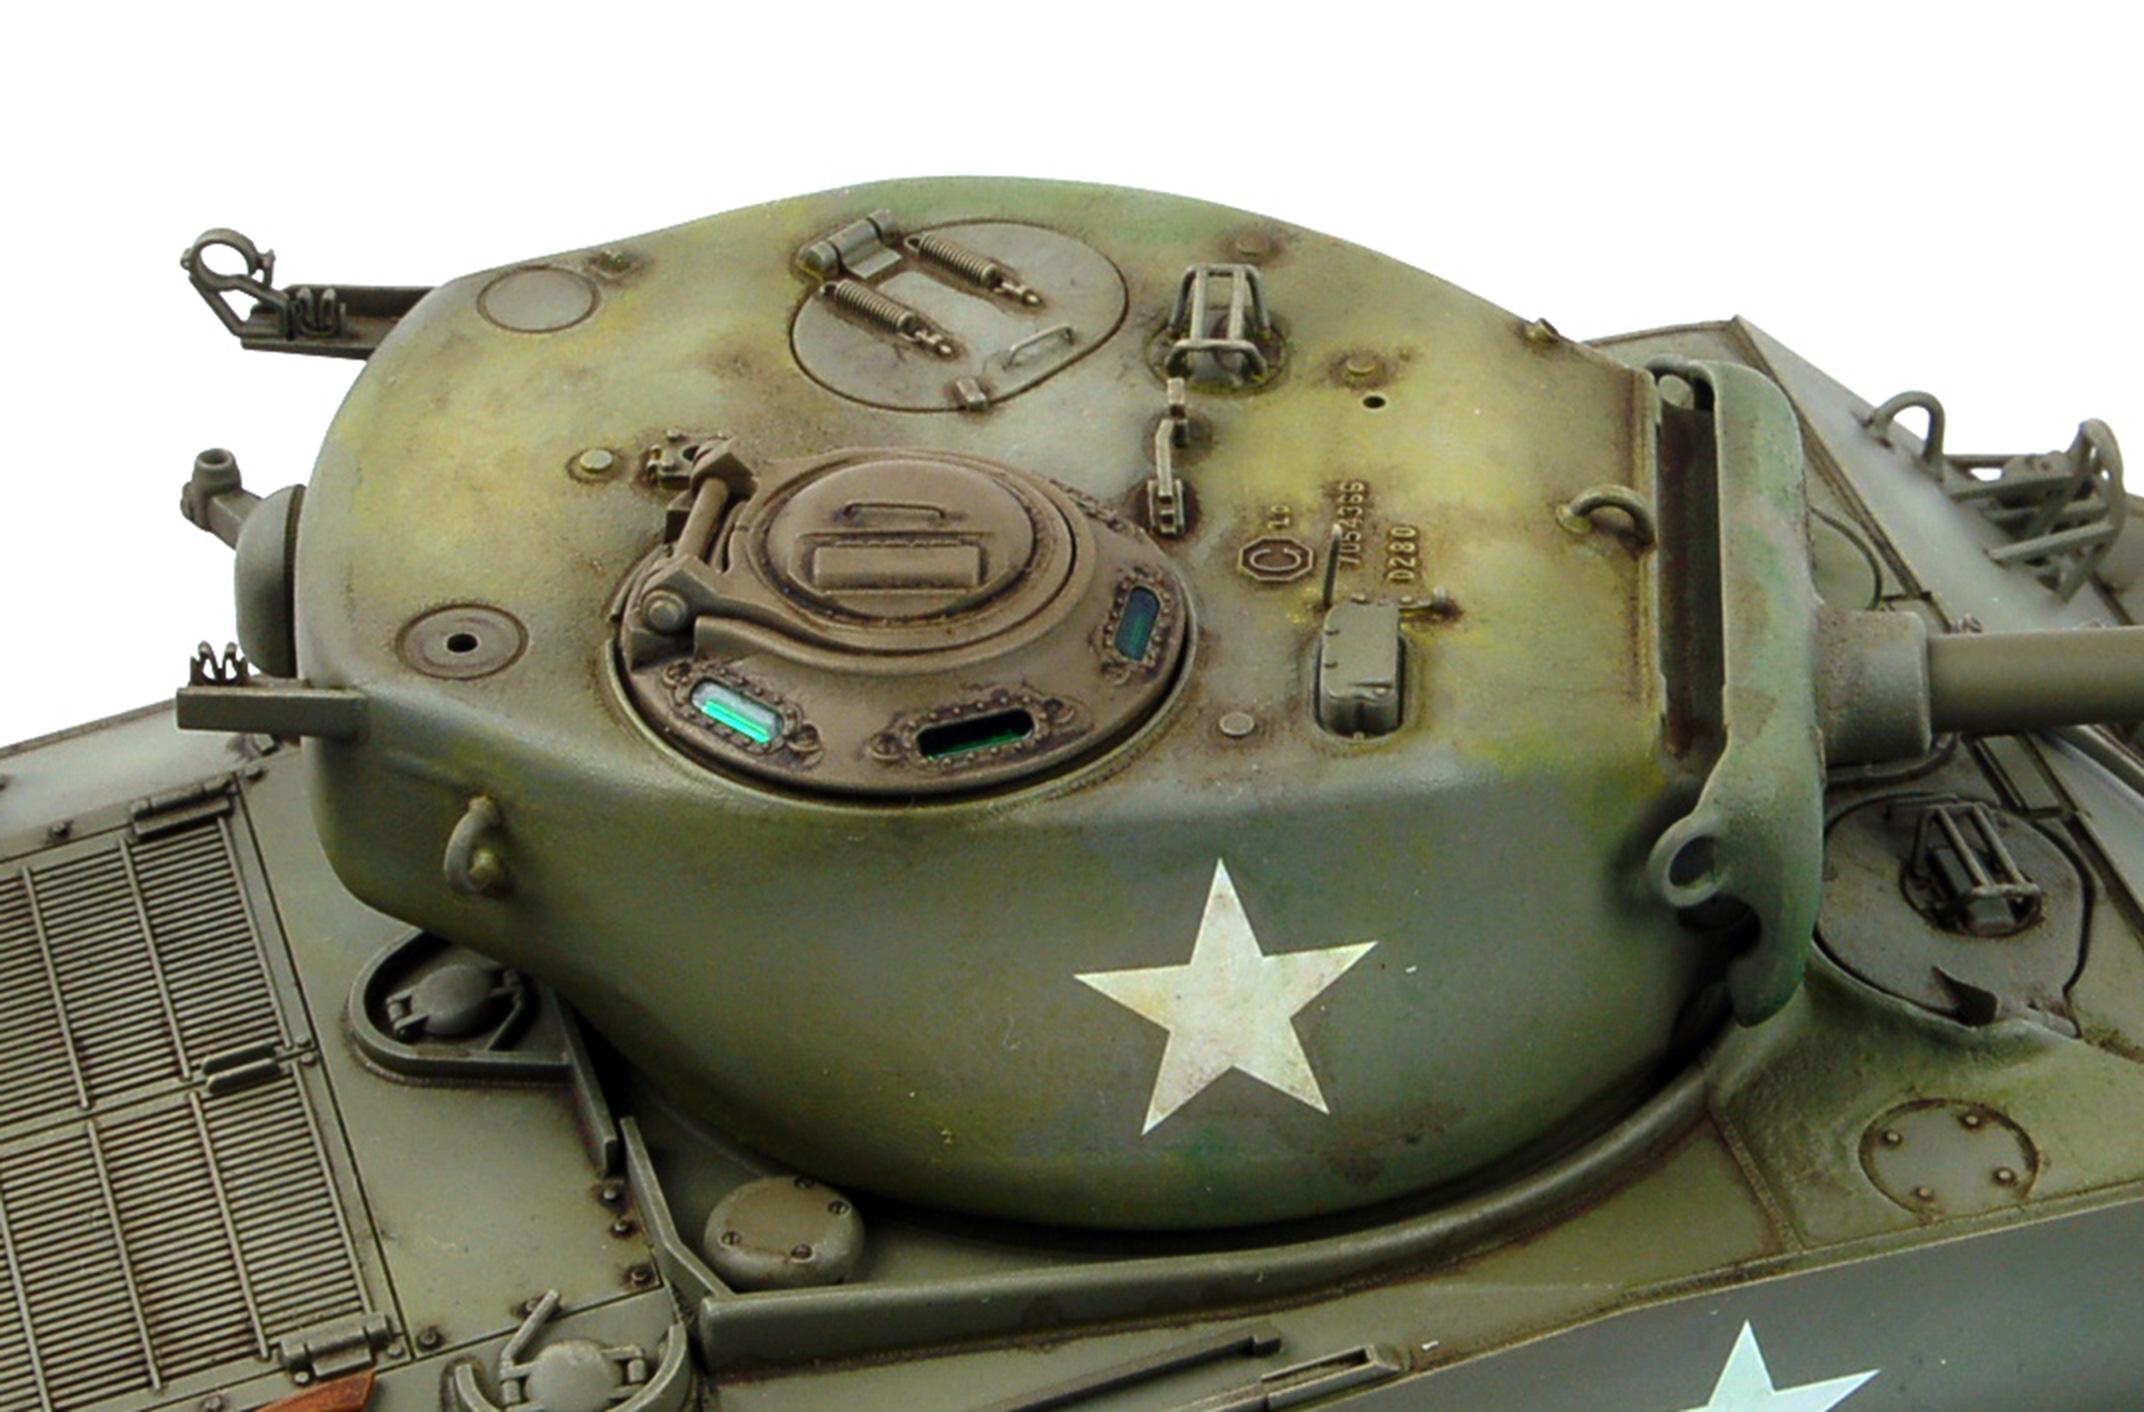 m4a3e8 sherman - armor - reviews